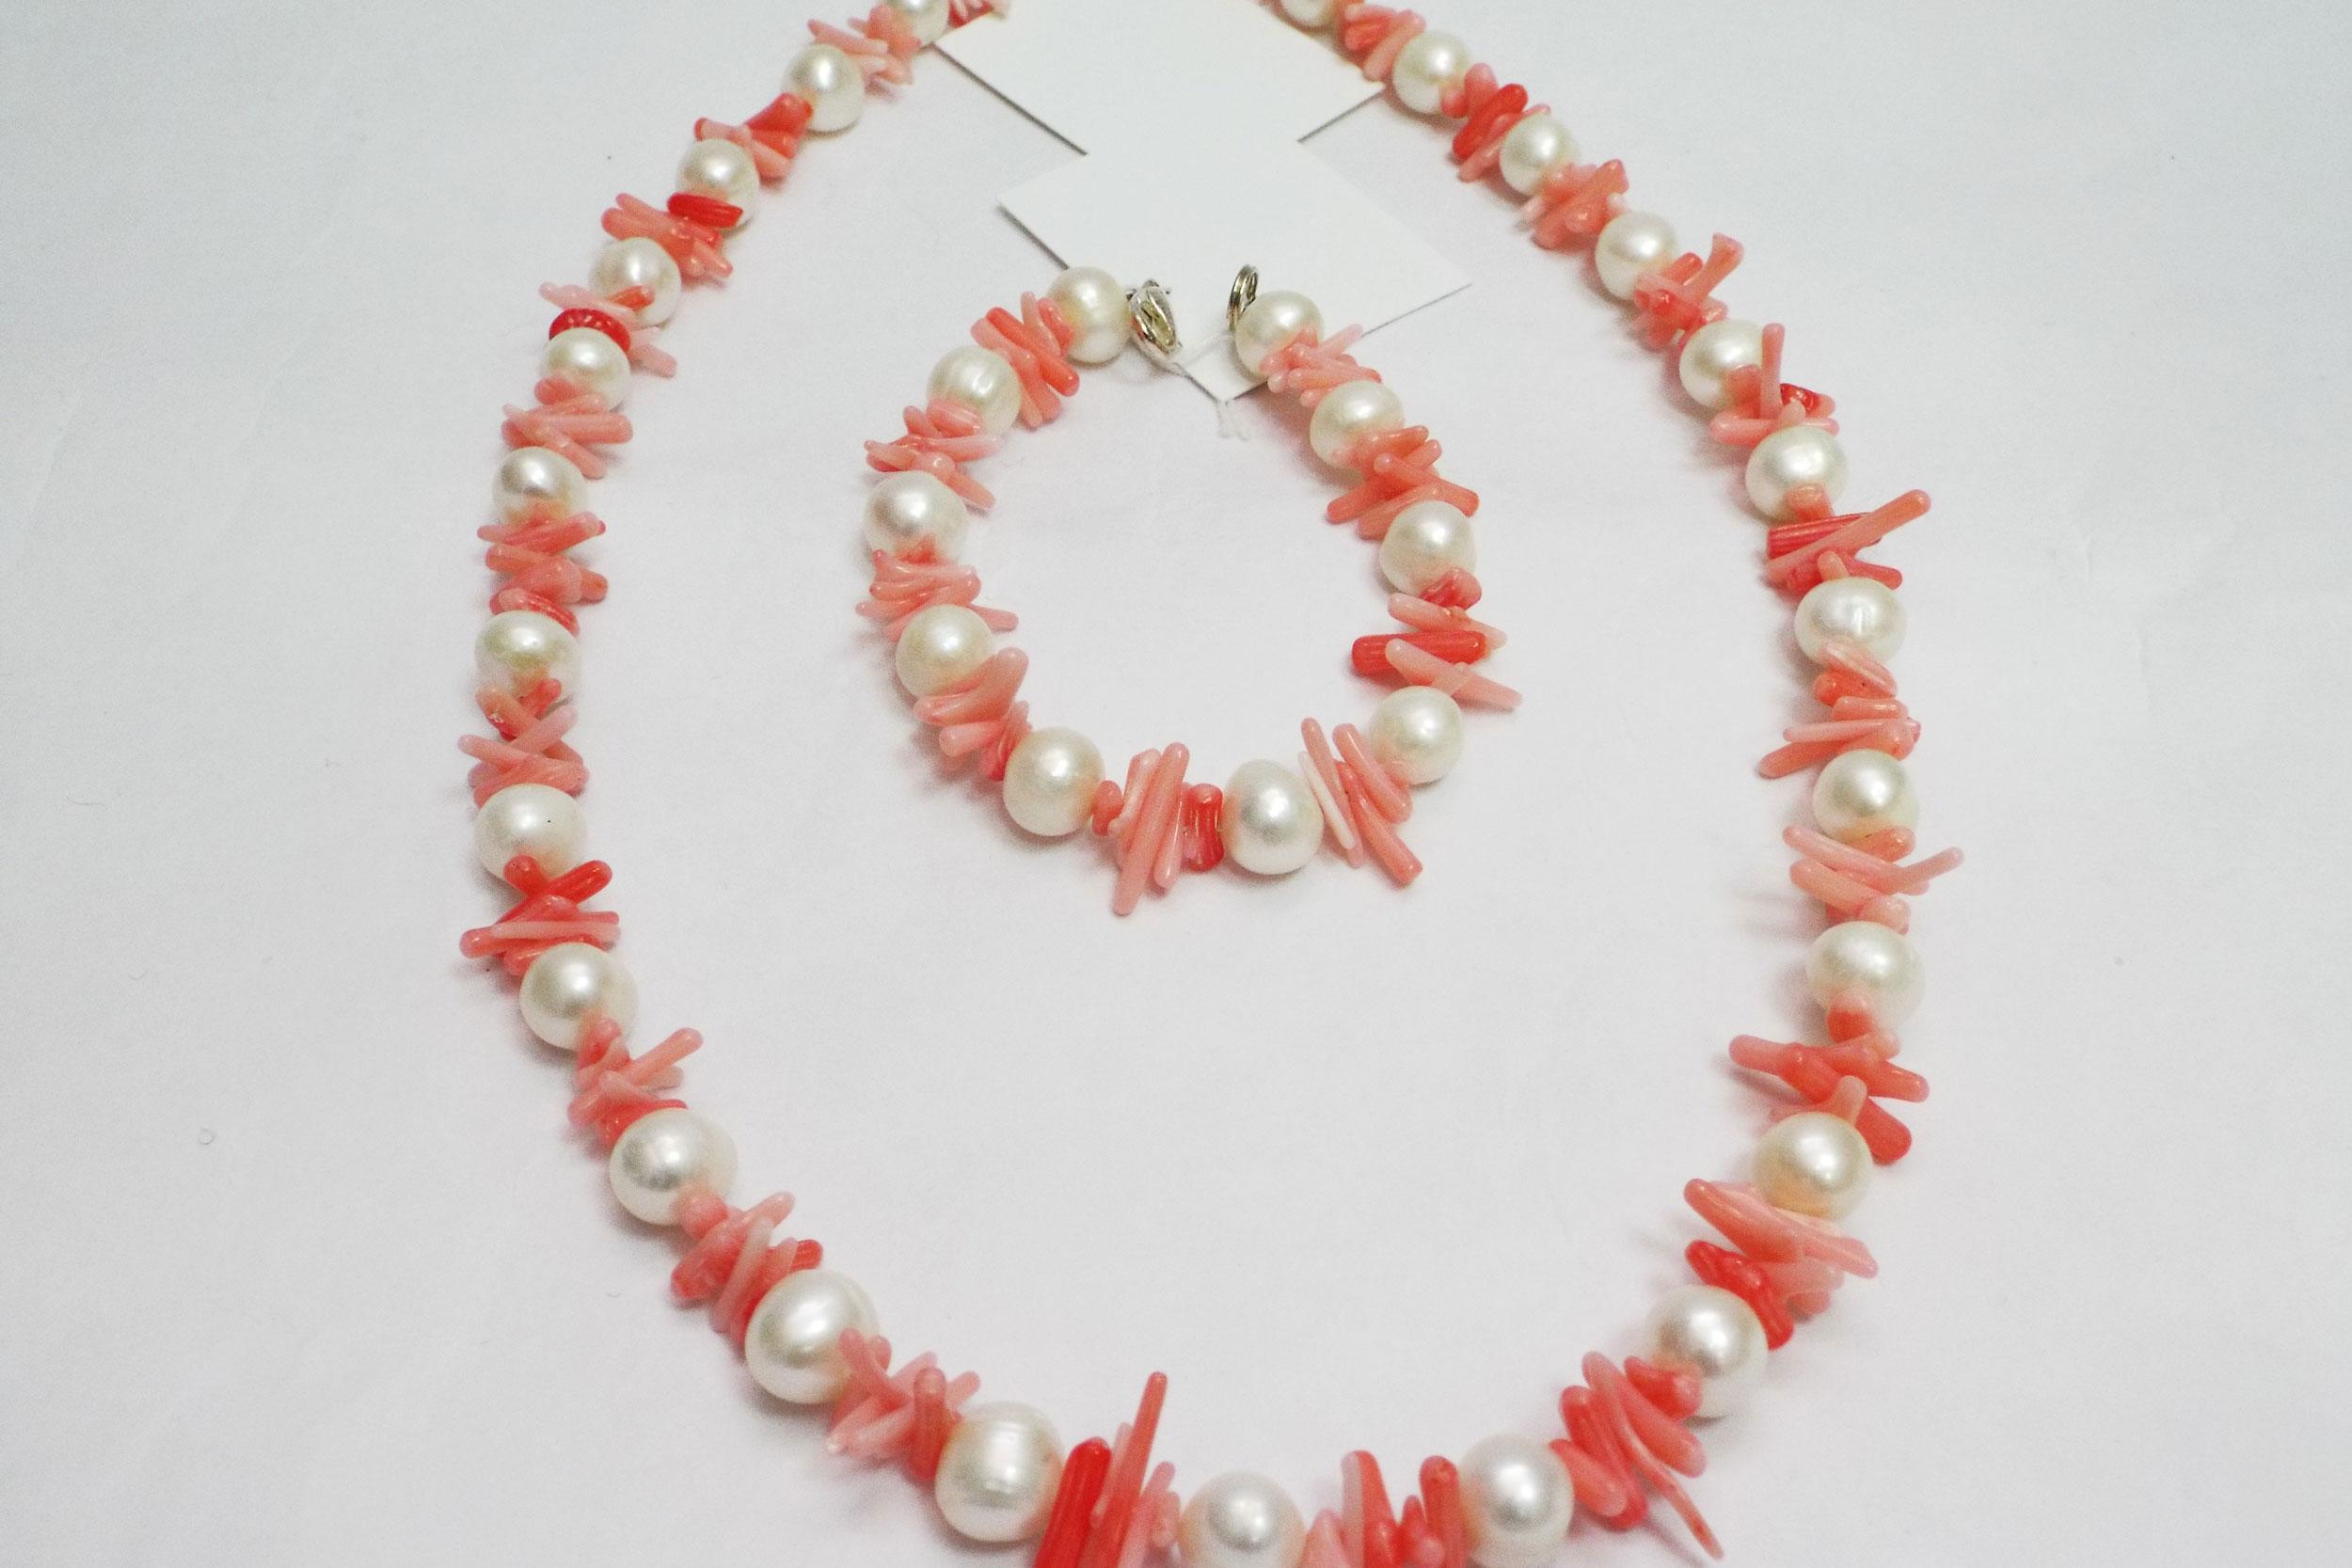 Бусы и браслет из коралла и жемчуга